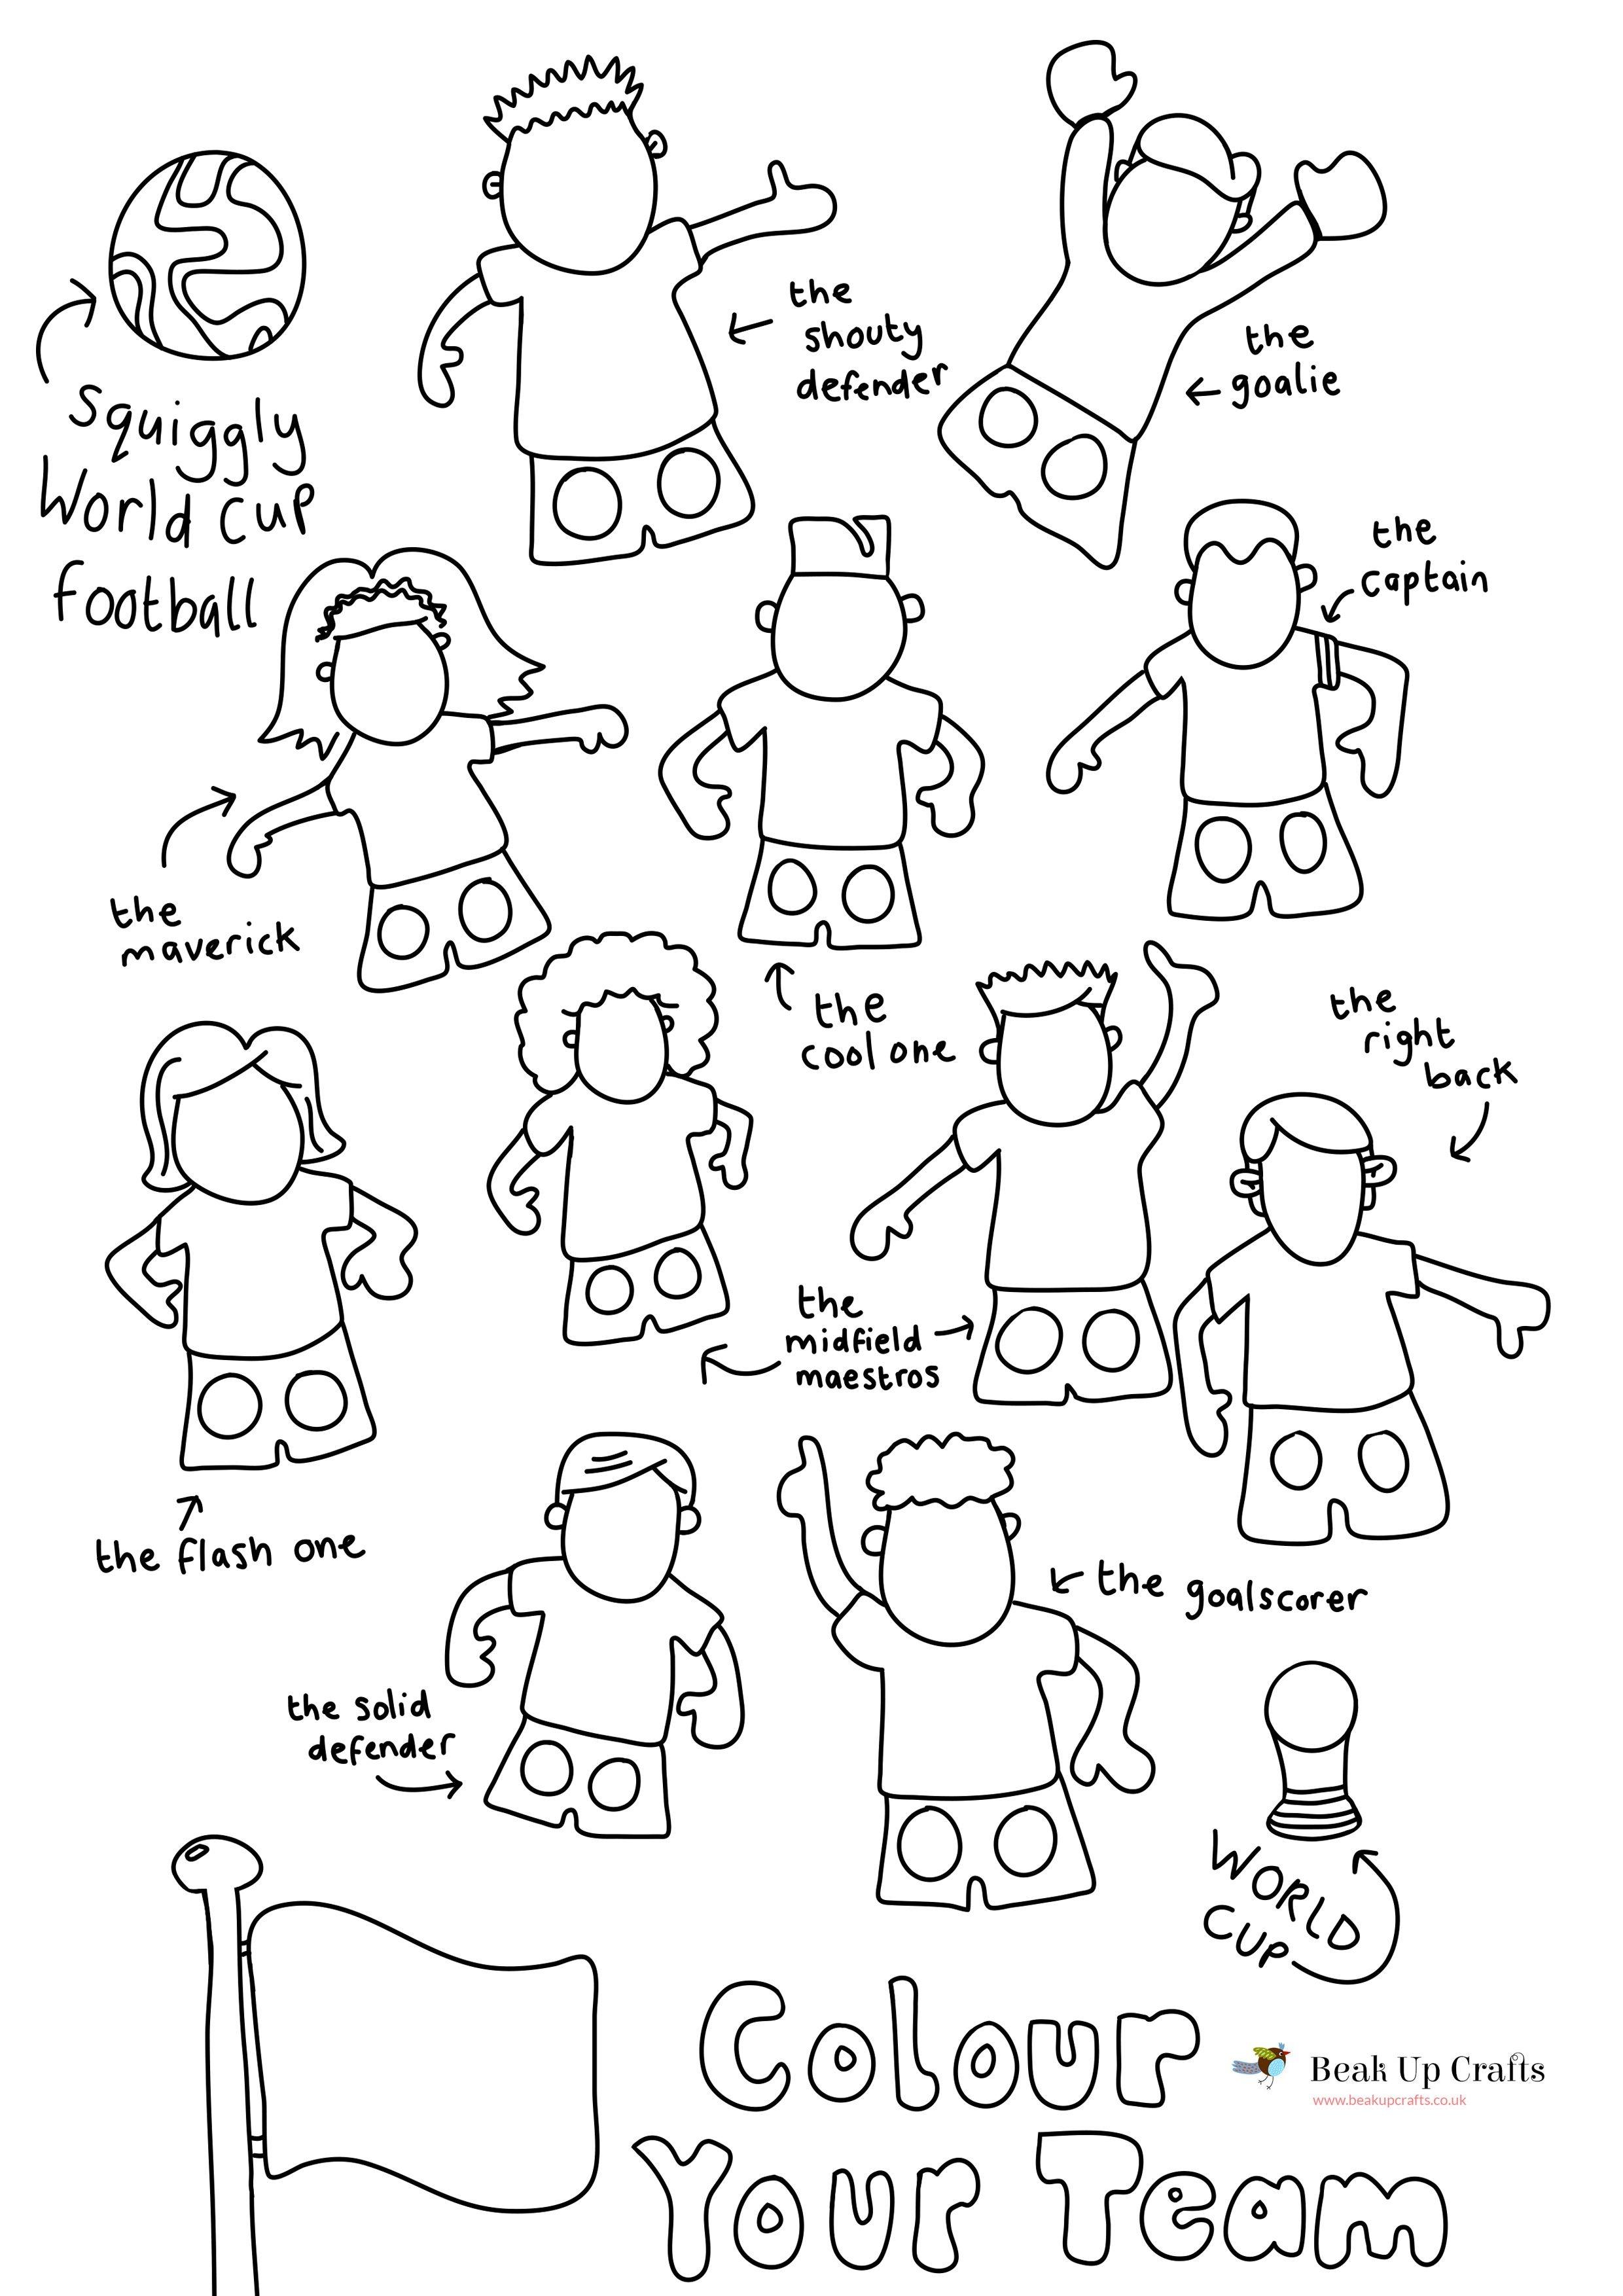 Free Printable - World Cup Football/soccer Player Paper Finger - Free Printable Finger Puppet Templates